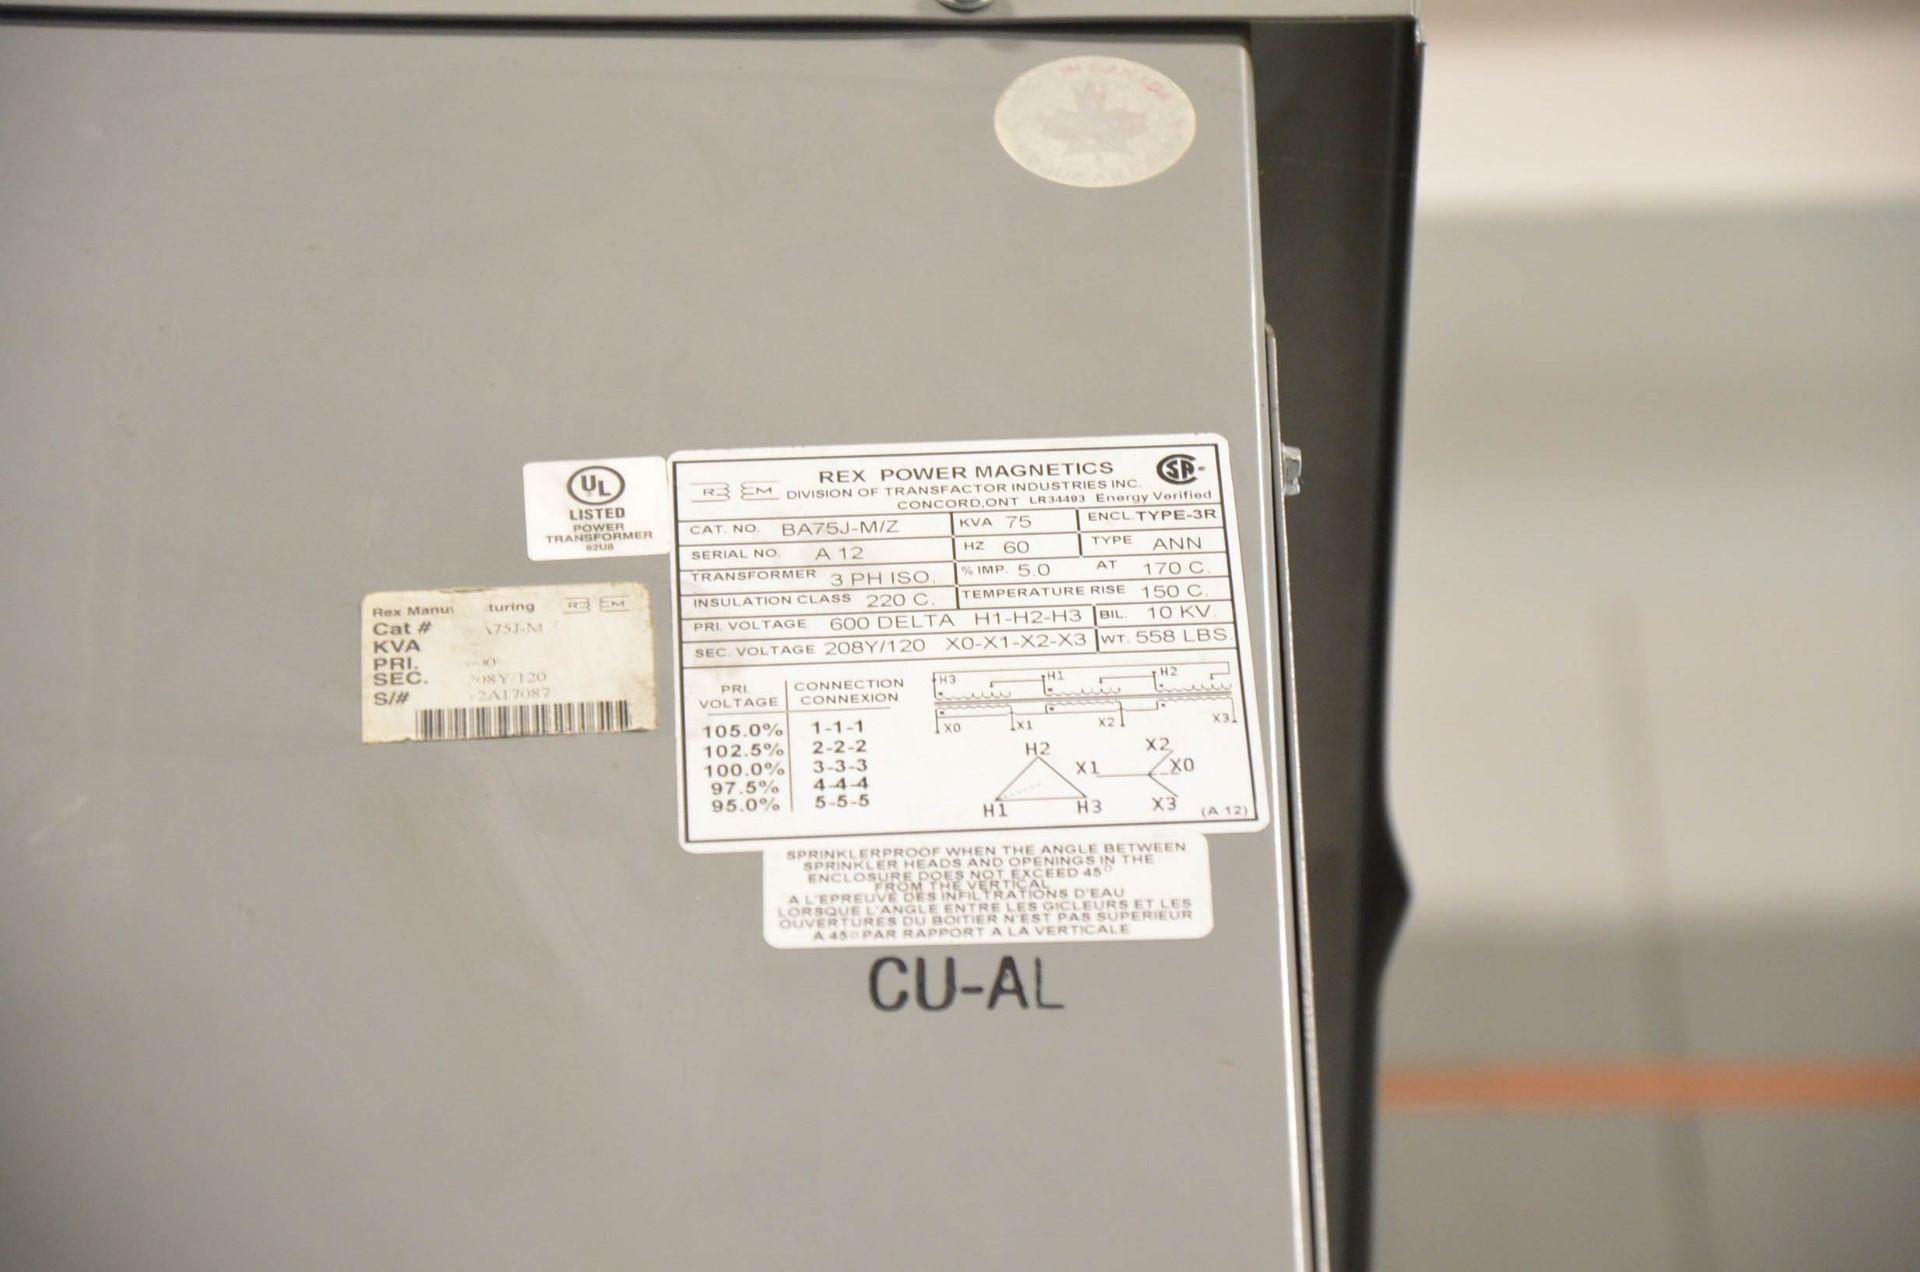 REX 112.5KVA/600-208-120V/3PH/60HZ TRANSFORMER (CI) [RIGGING FEES FOR LOT #220 - $50 USD PLUS - Image 2 of 2